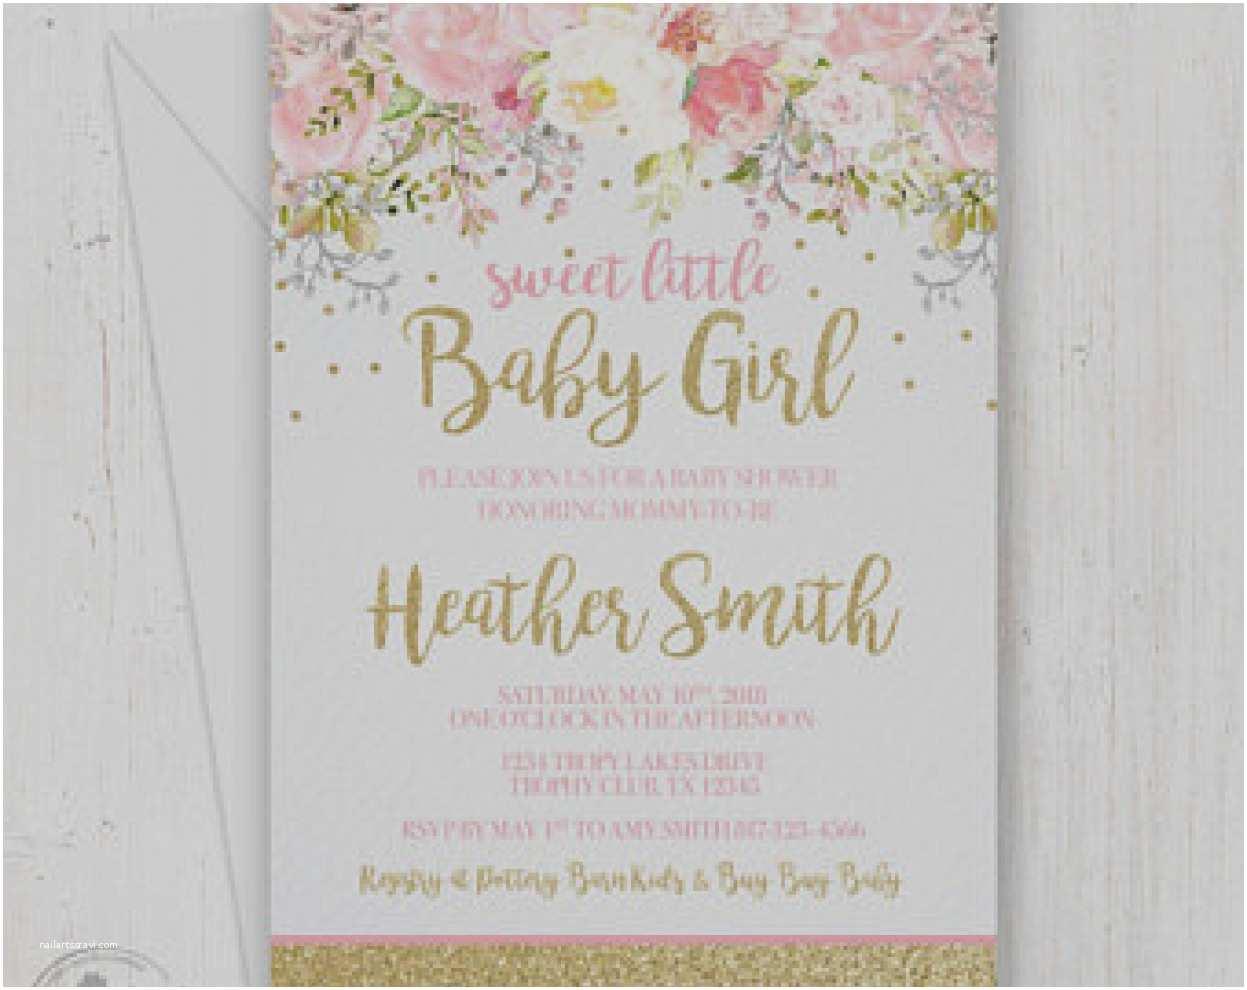 Cheap Baby Shower Invitations Girl Nice Baby Shower Invites Etsy Mold Invitations Design